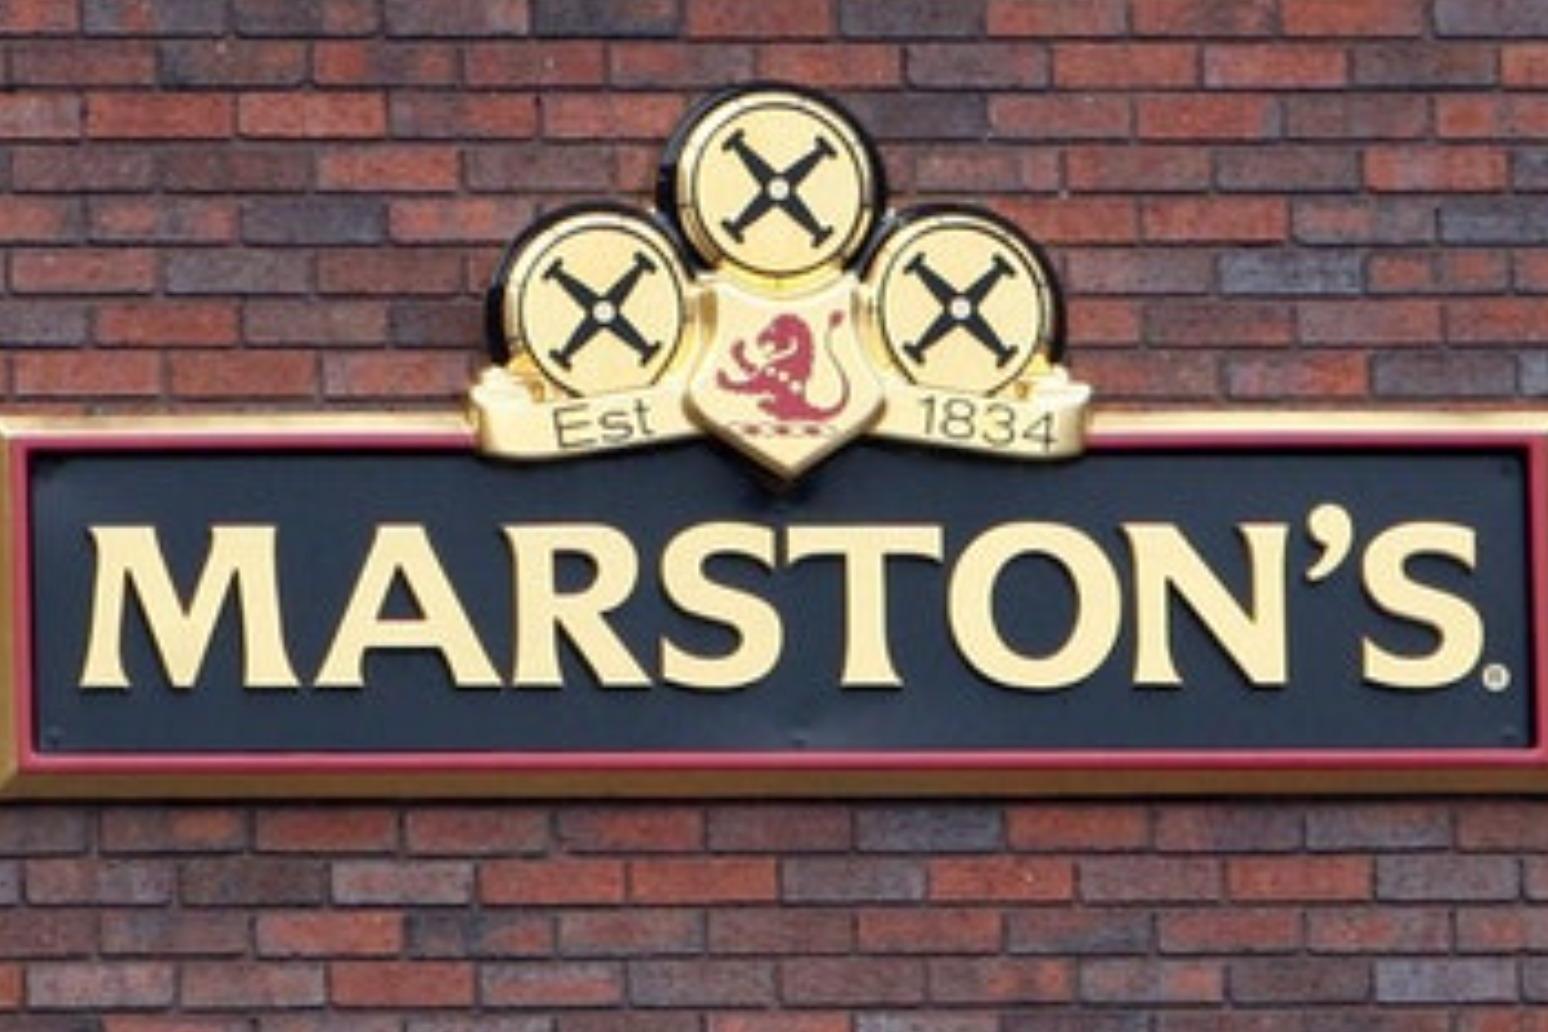 Pub group Marston's to cut 2,150 jobs due to coronavirus restrictions